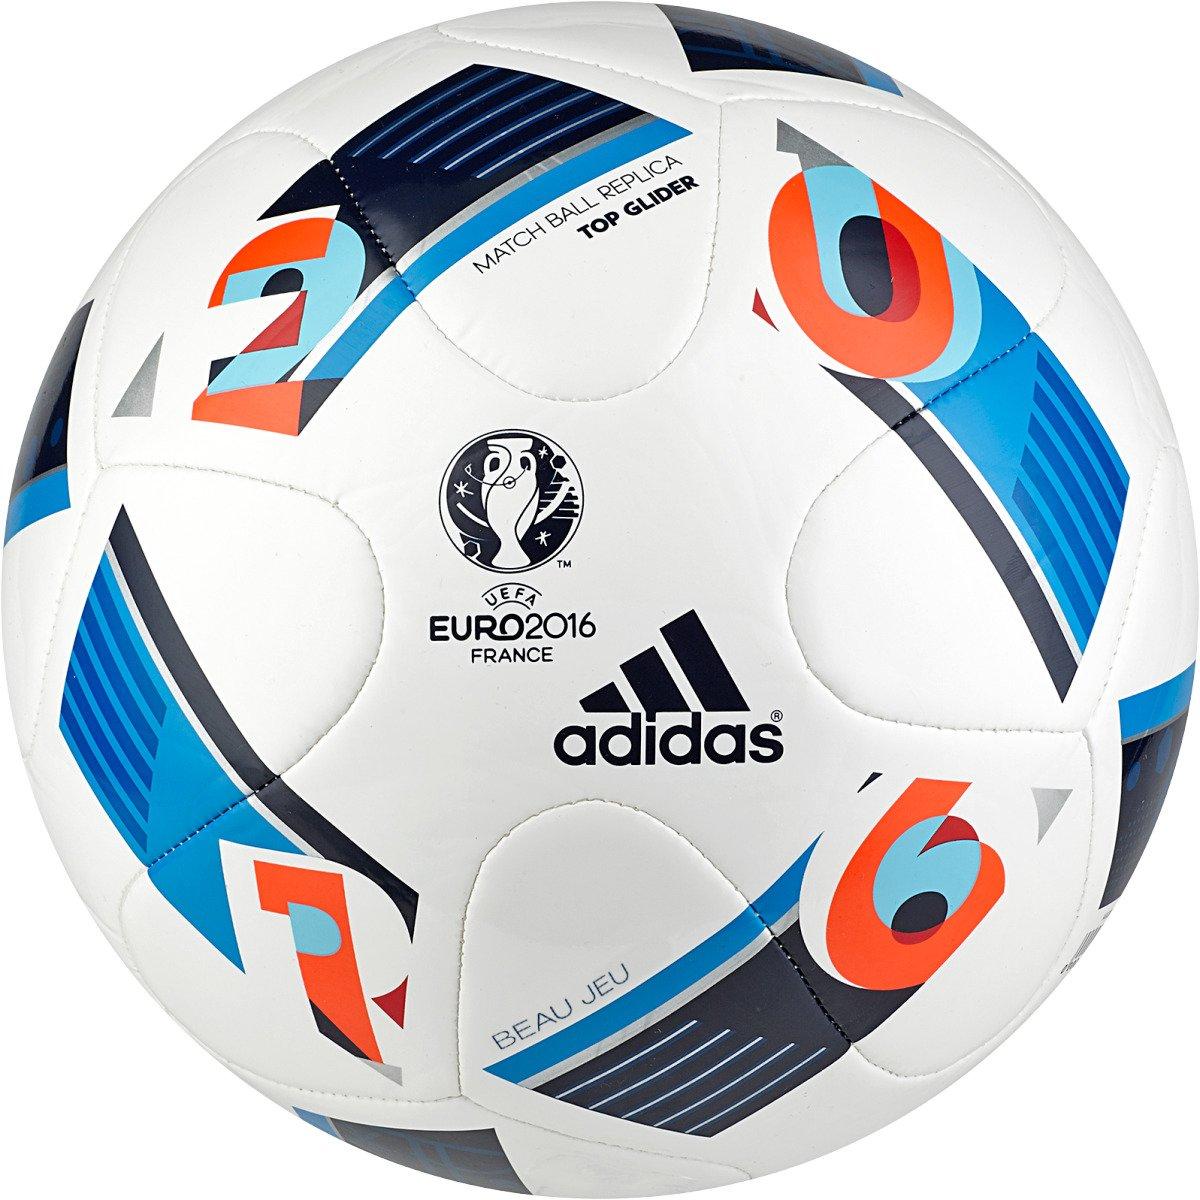 adidas™ Euro 16 Top Glider Soccer Ball